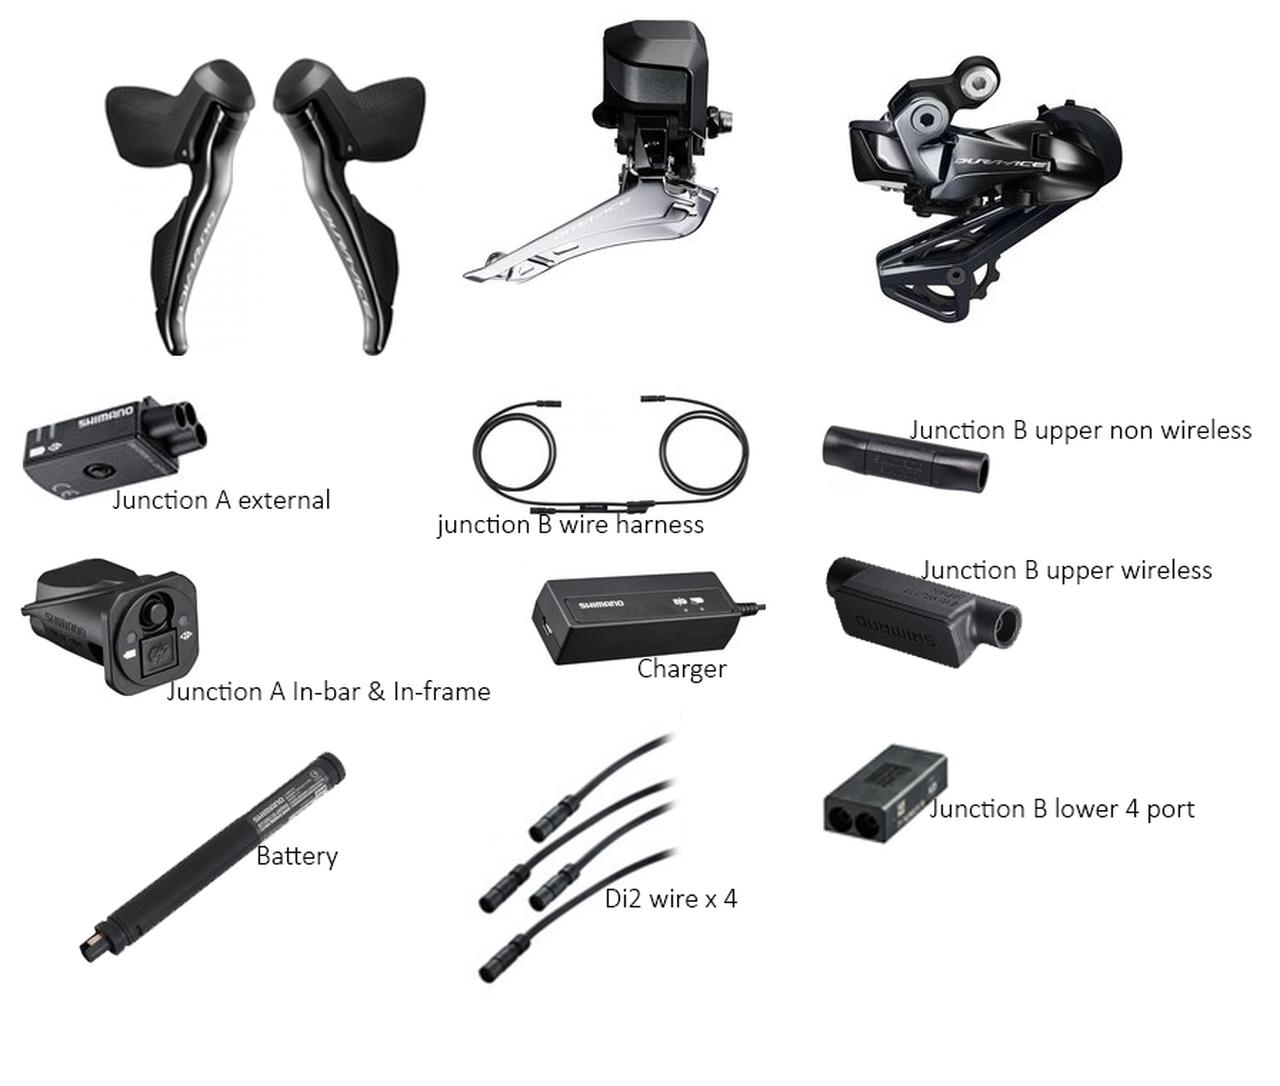 Mengenal Frame Sepeda Di2 Ready